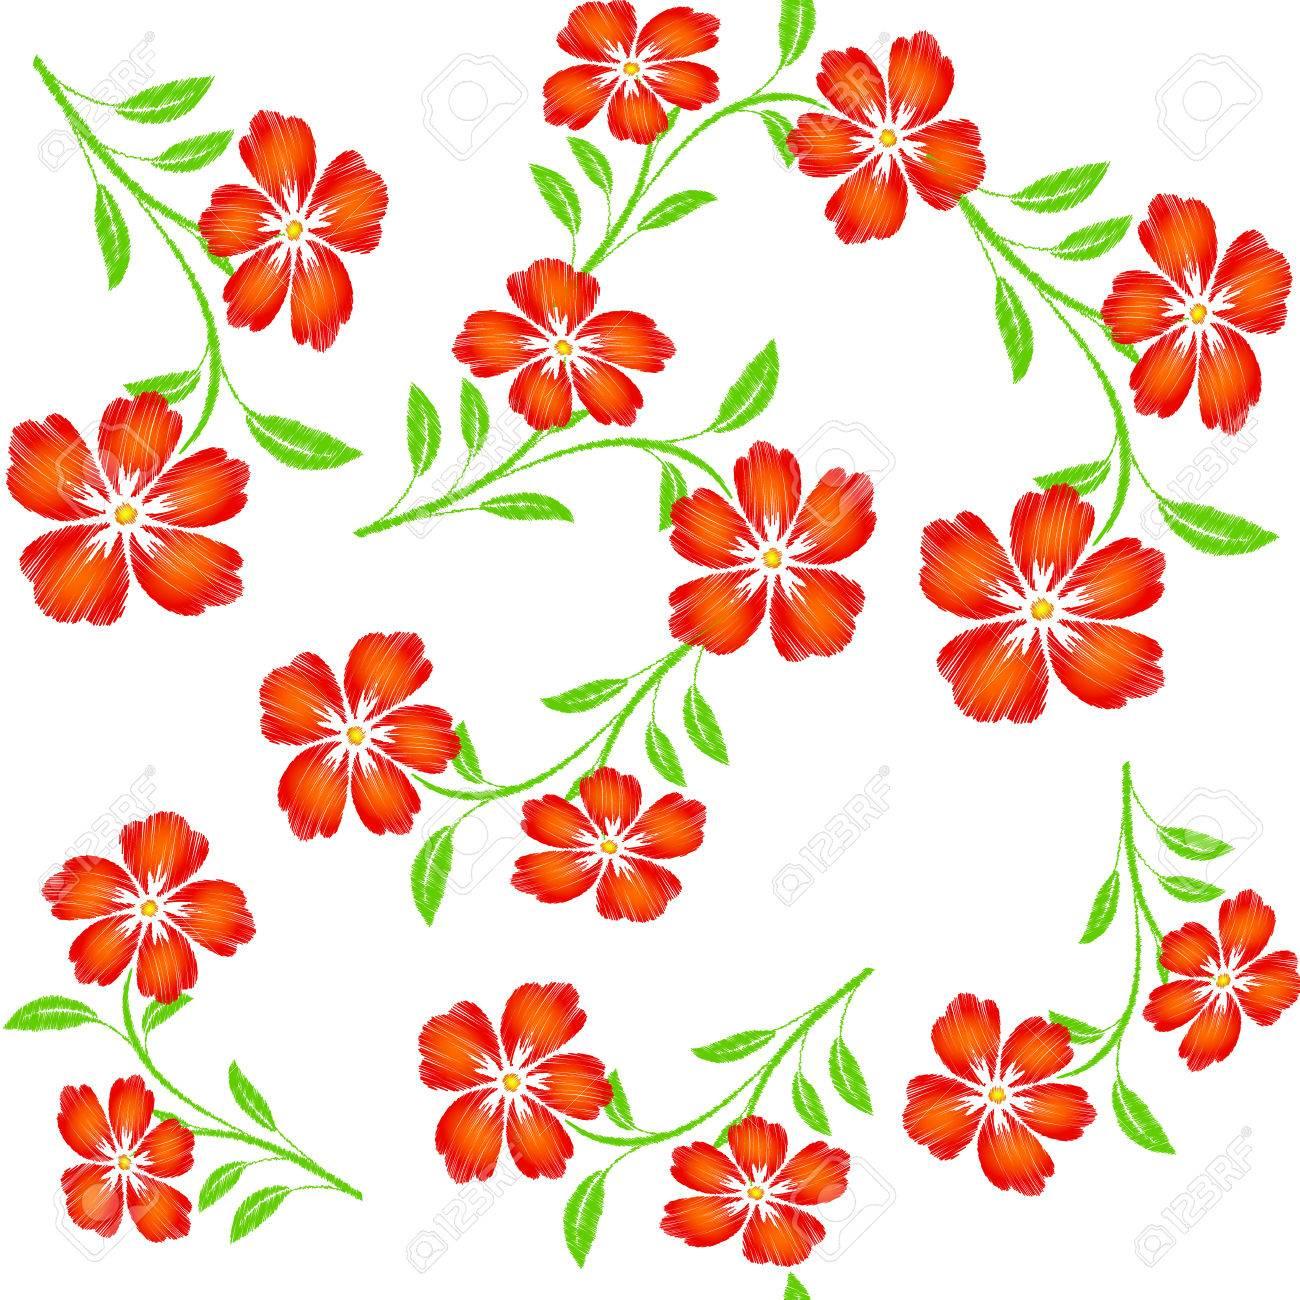 Flores De Naranja Rojo Bordado Sobre Fondo Blanco Patrón ...